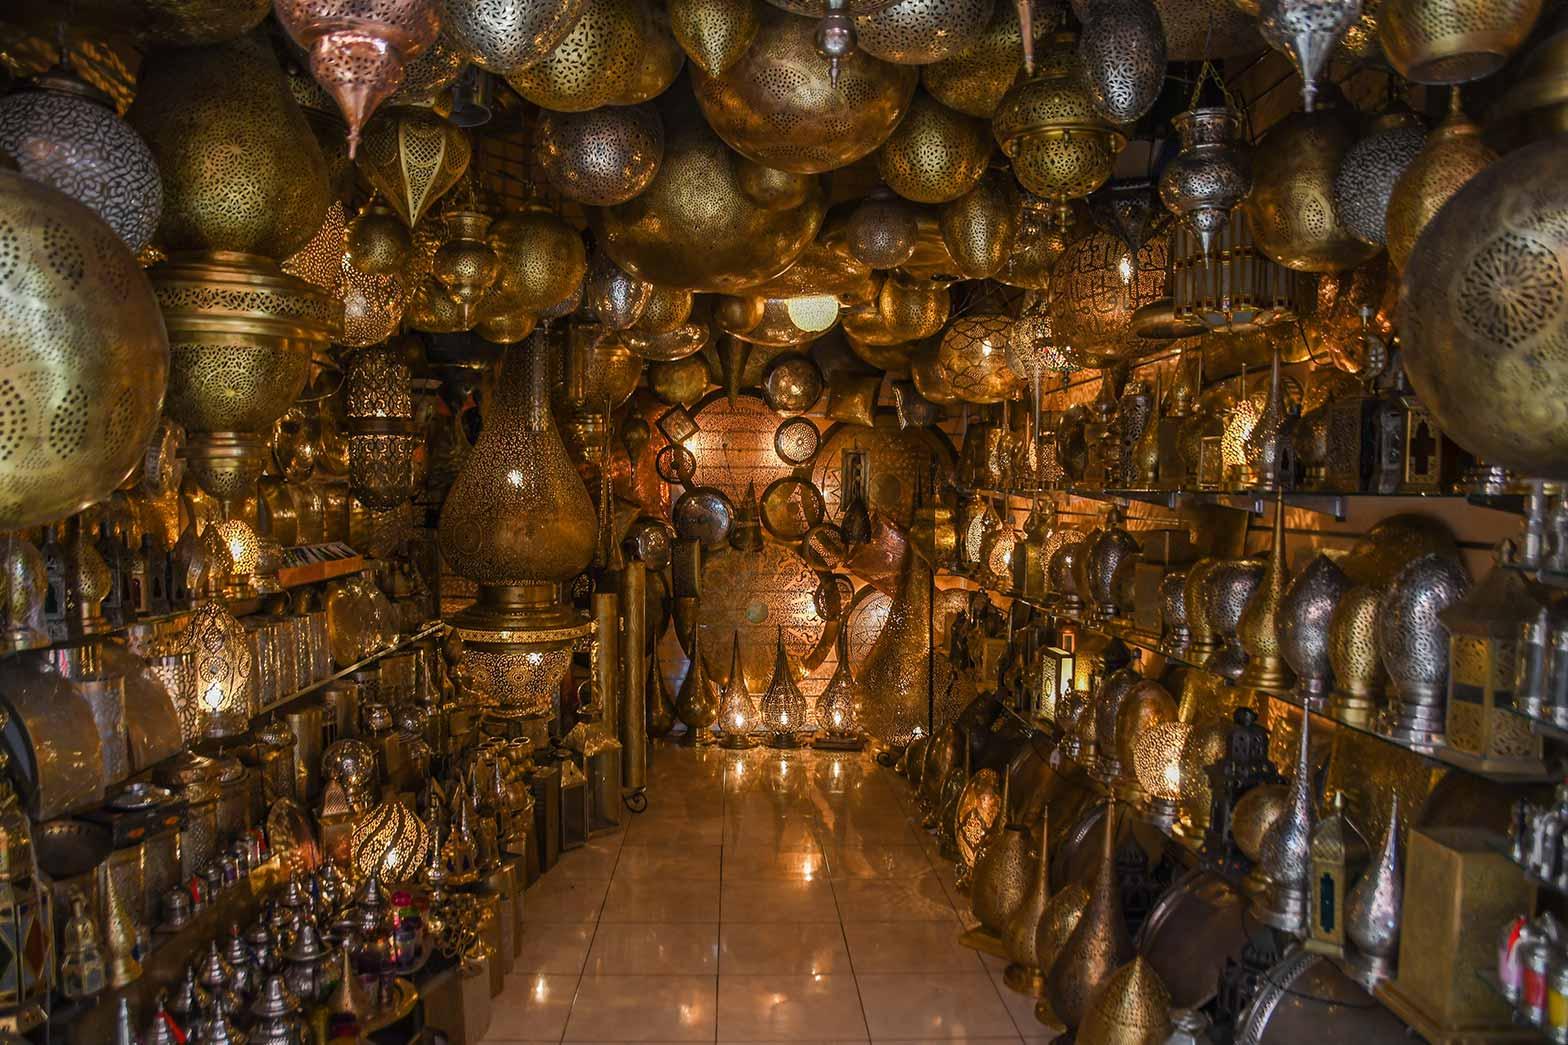 Handmade brass lampshades